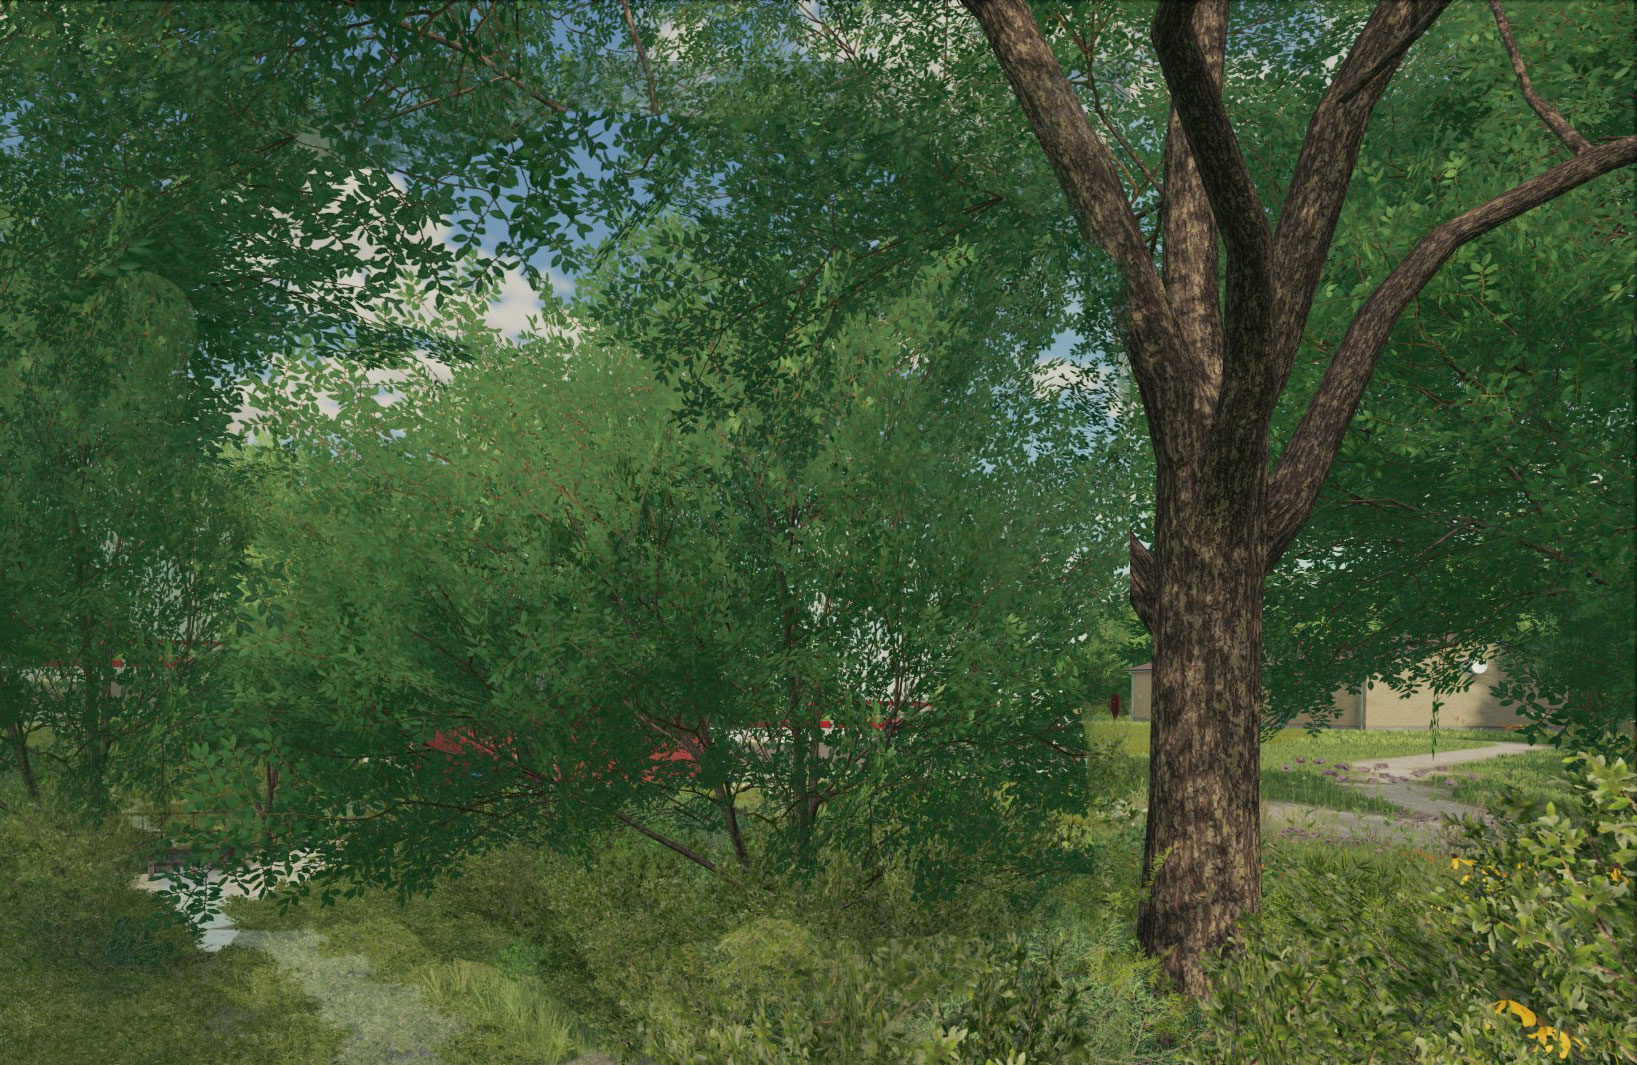 FS22 Straight trees